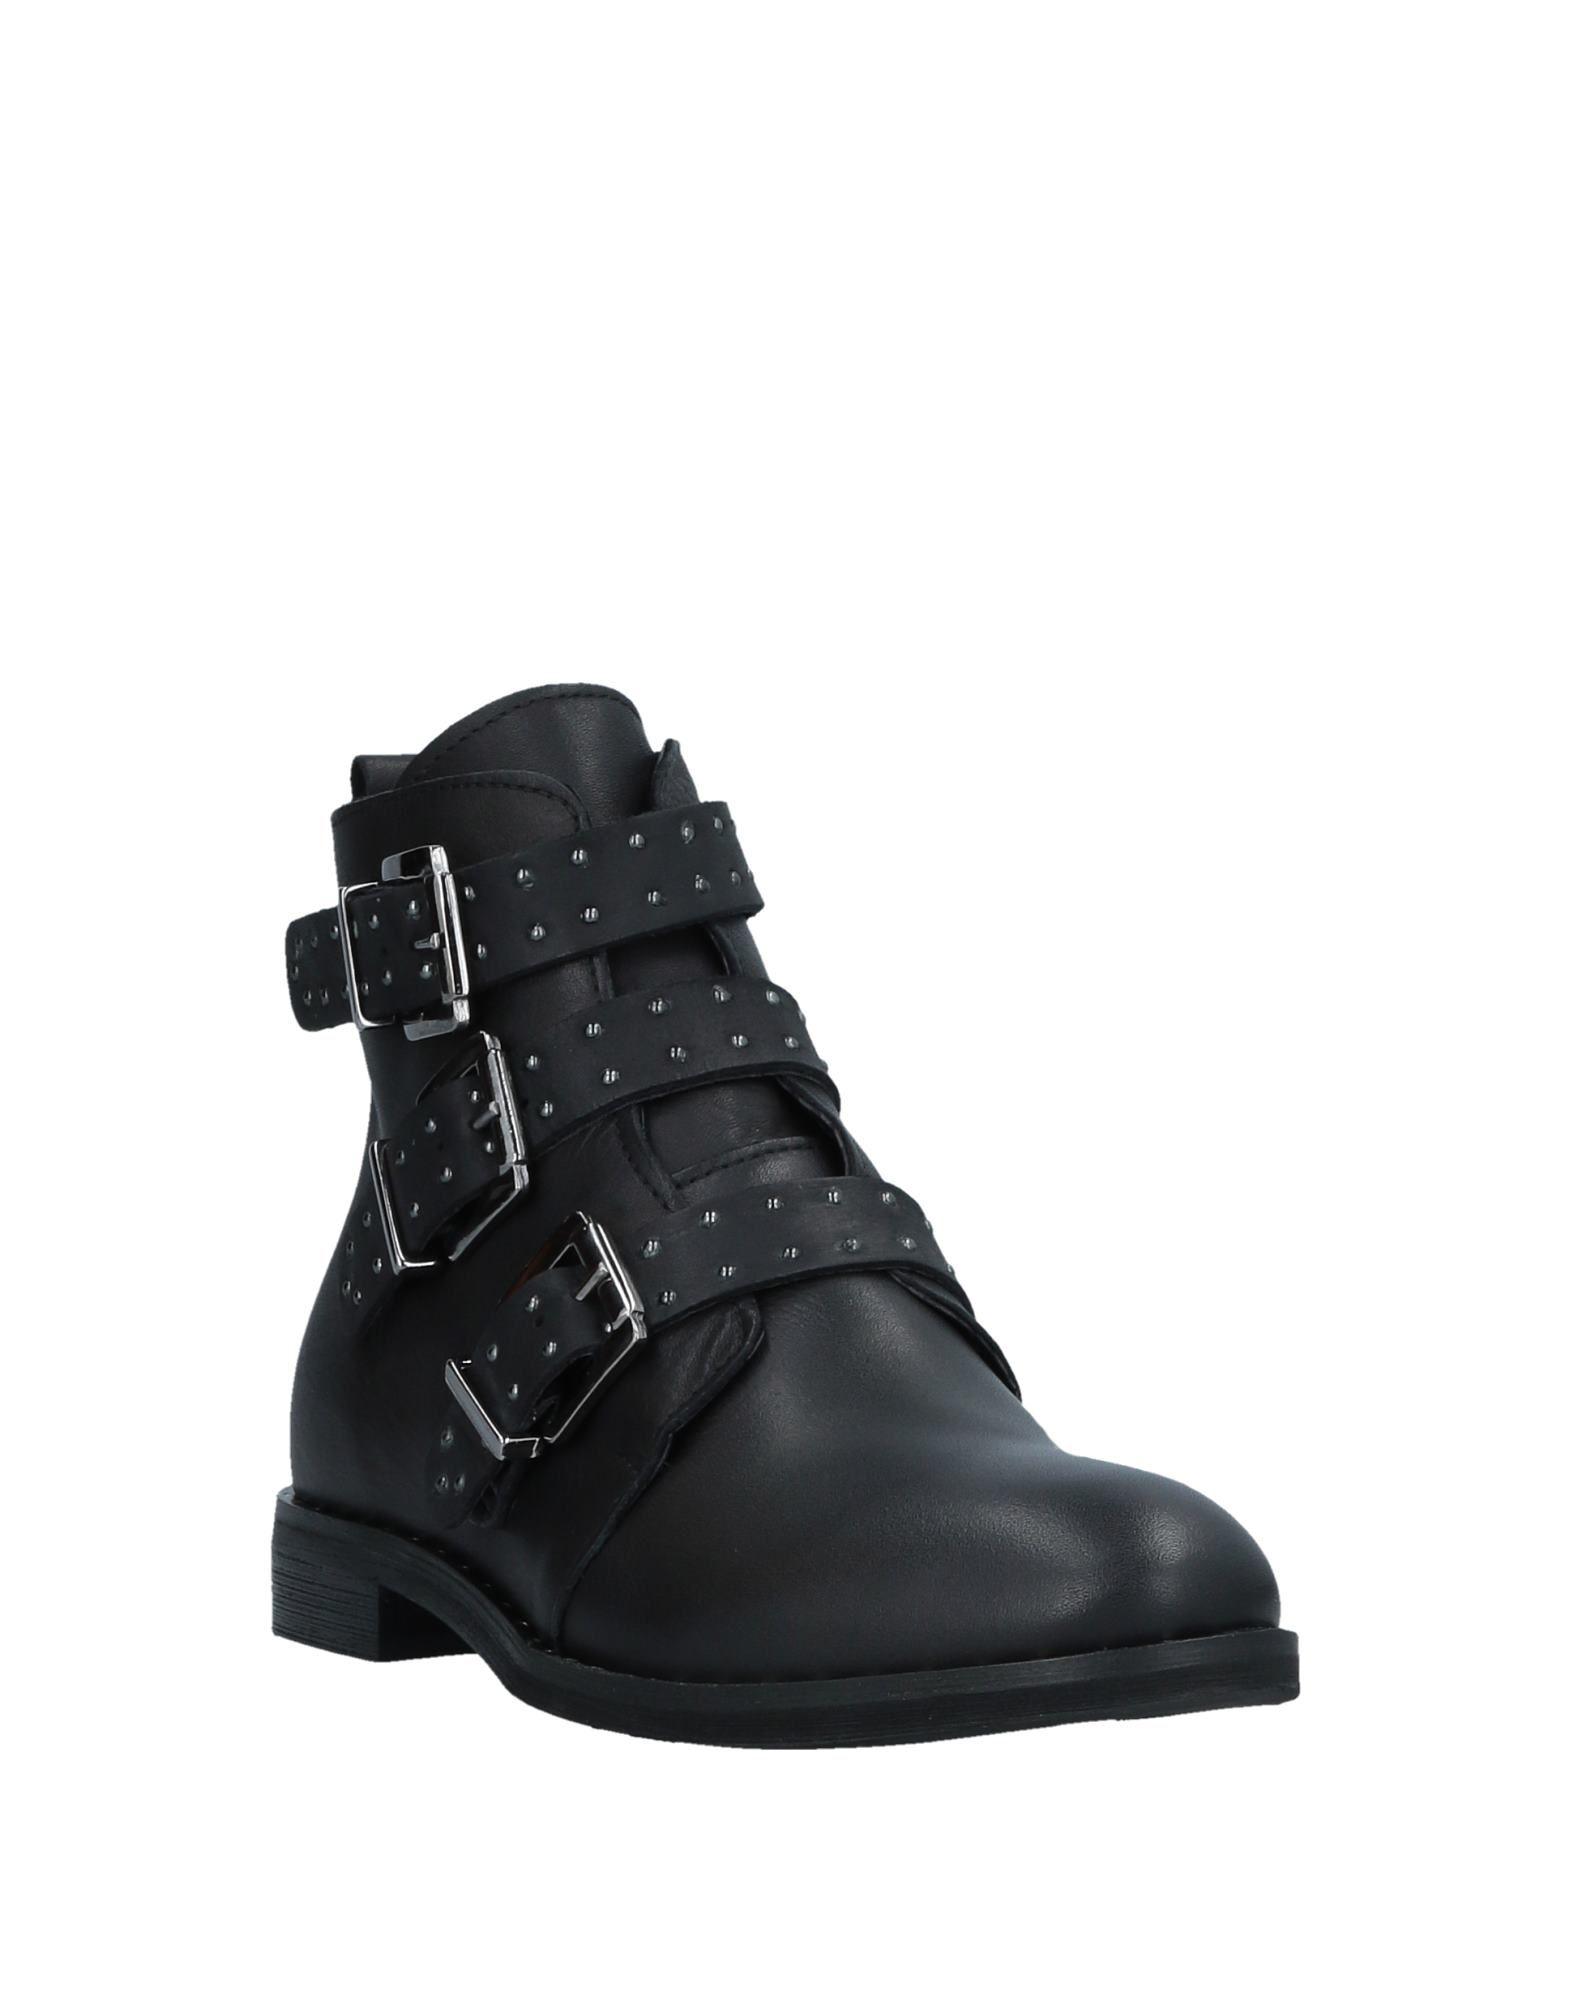 Le Pepite Neue Stiefelette Damen  11528352DU Neue Pepite Schuhe 6cd8c3